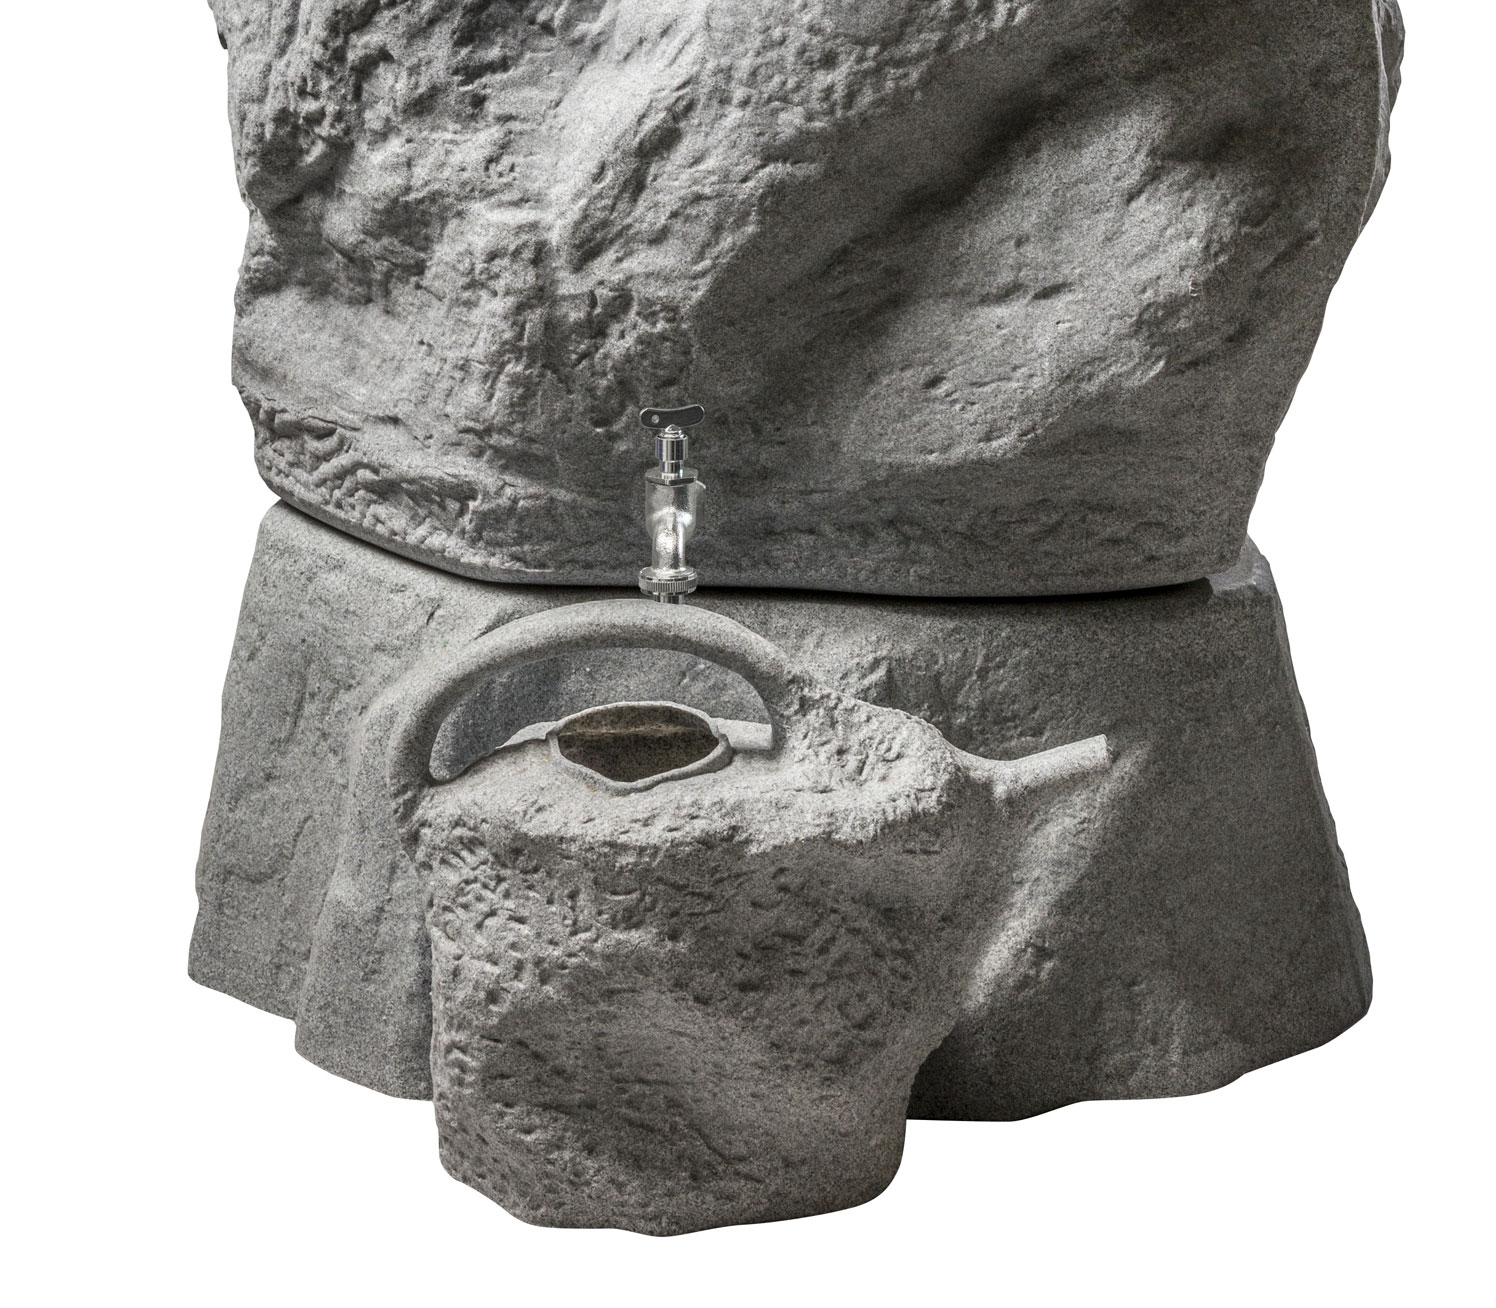 Gießkanne GreenLife Natursteindesign 9 Liter sand Bild 2